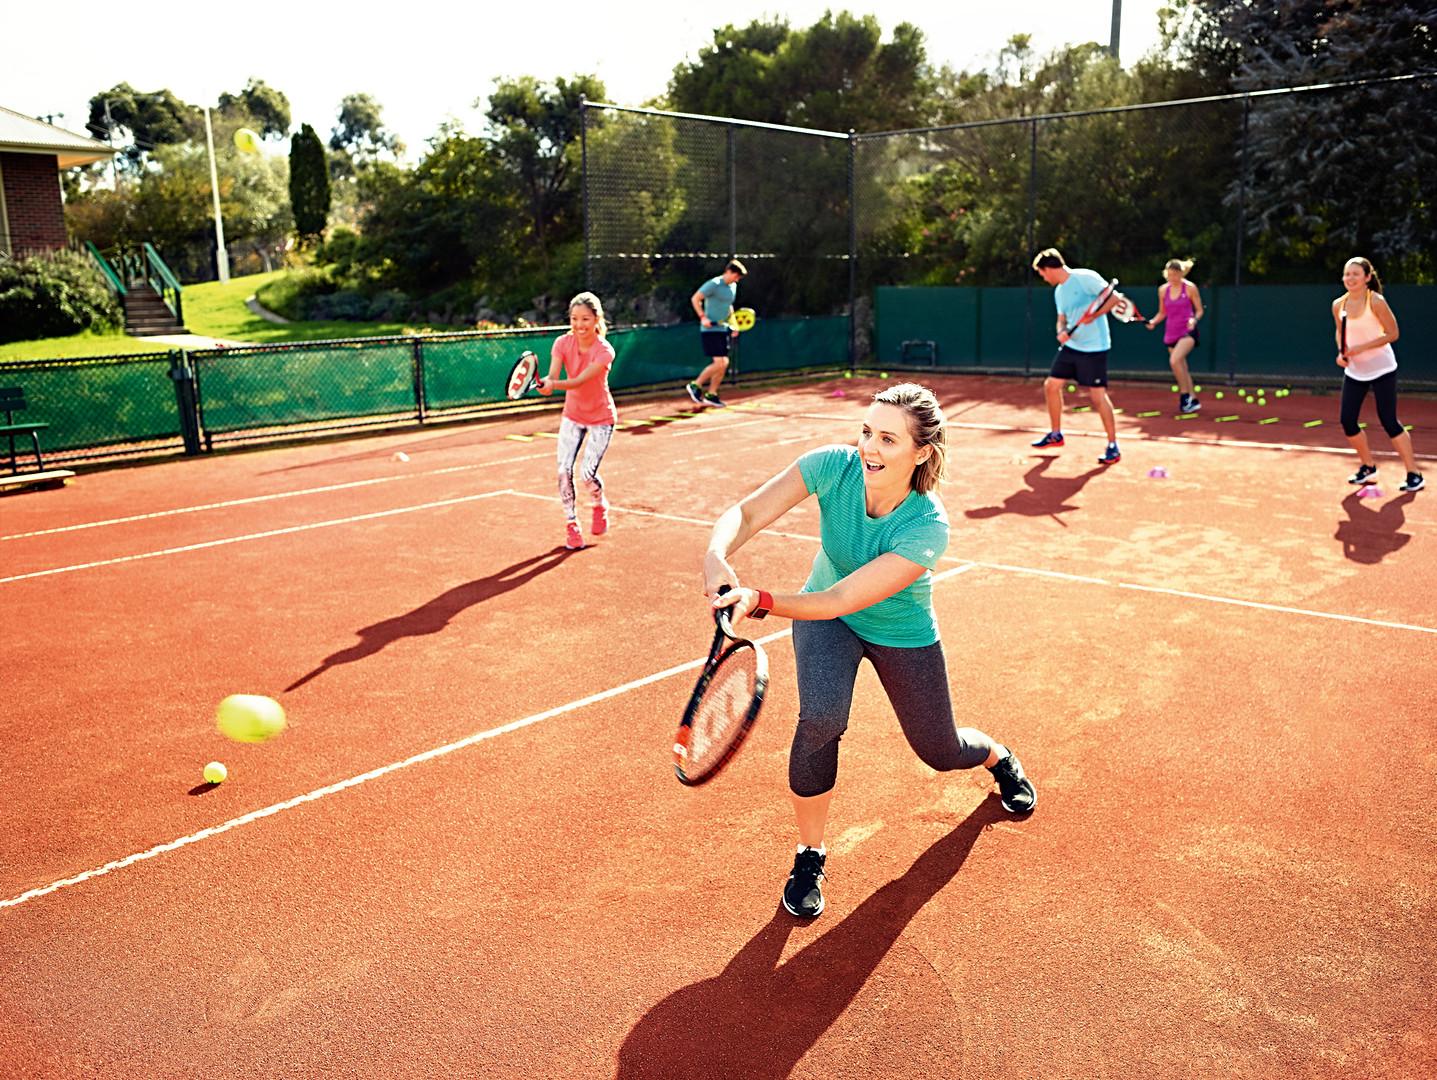 Fitbit Cardio Tennis Image2.jpg